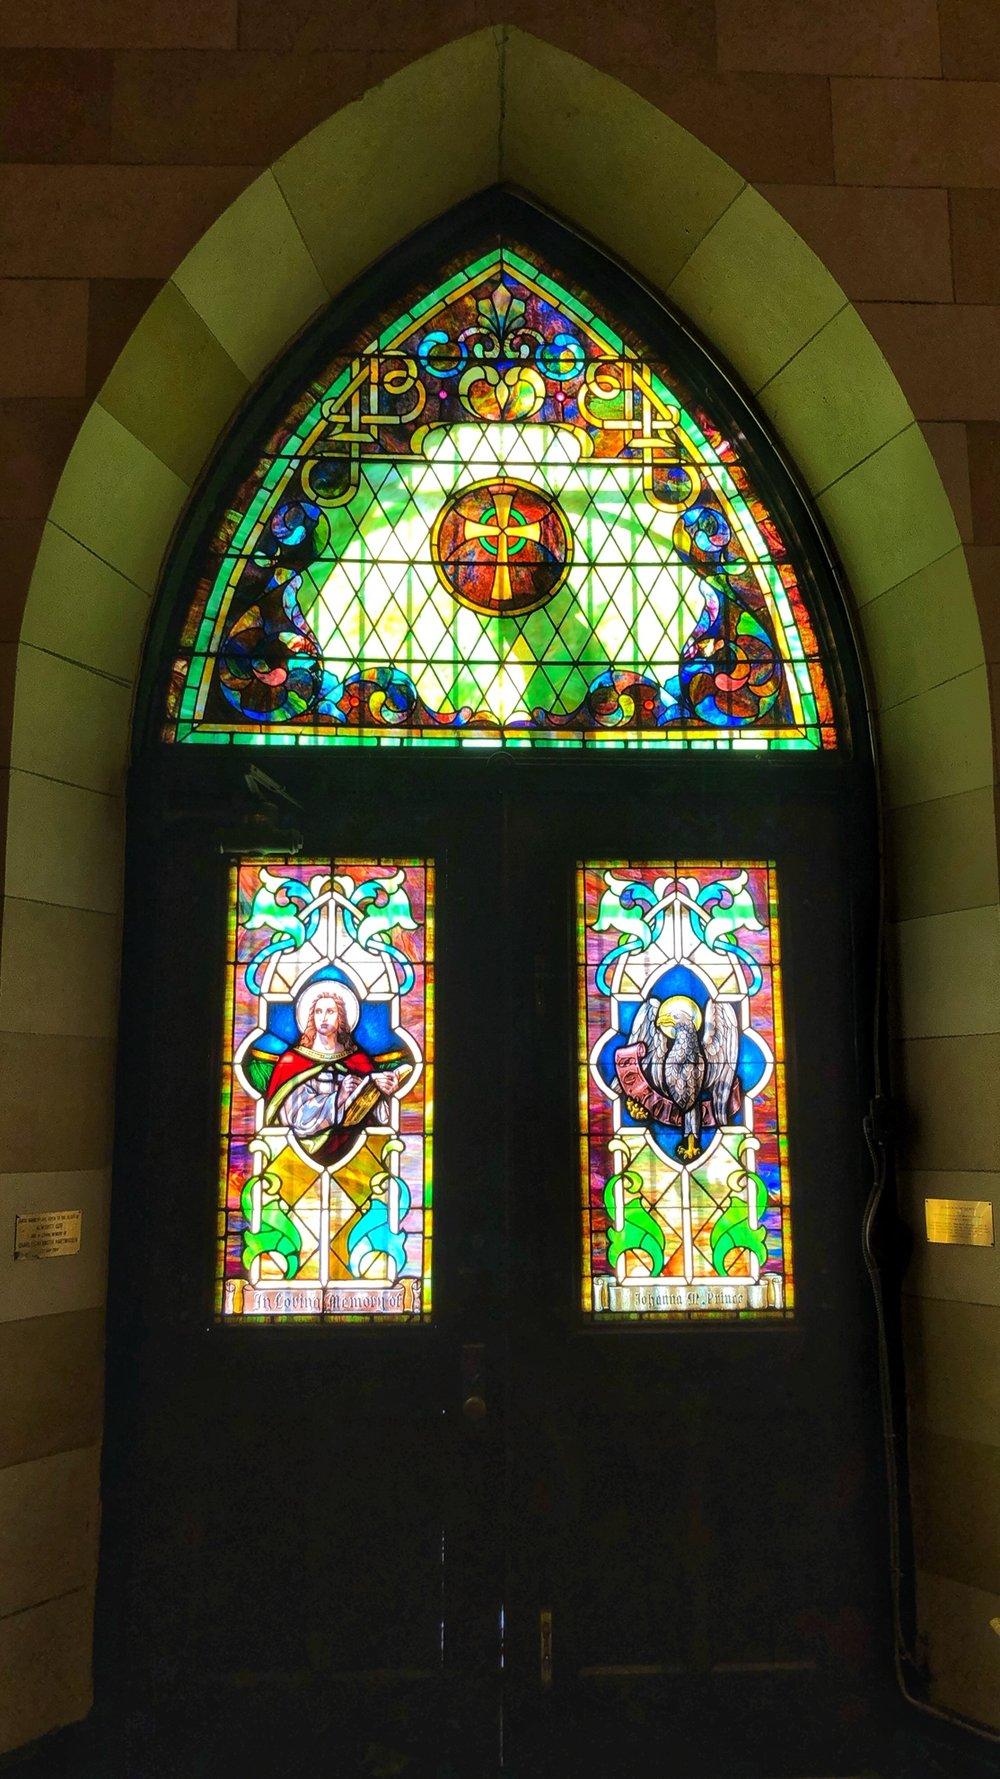 Inside St. John's Episcopal Church at 3009 Greenmount Avenue